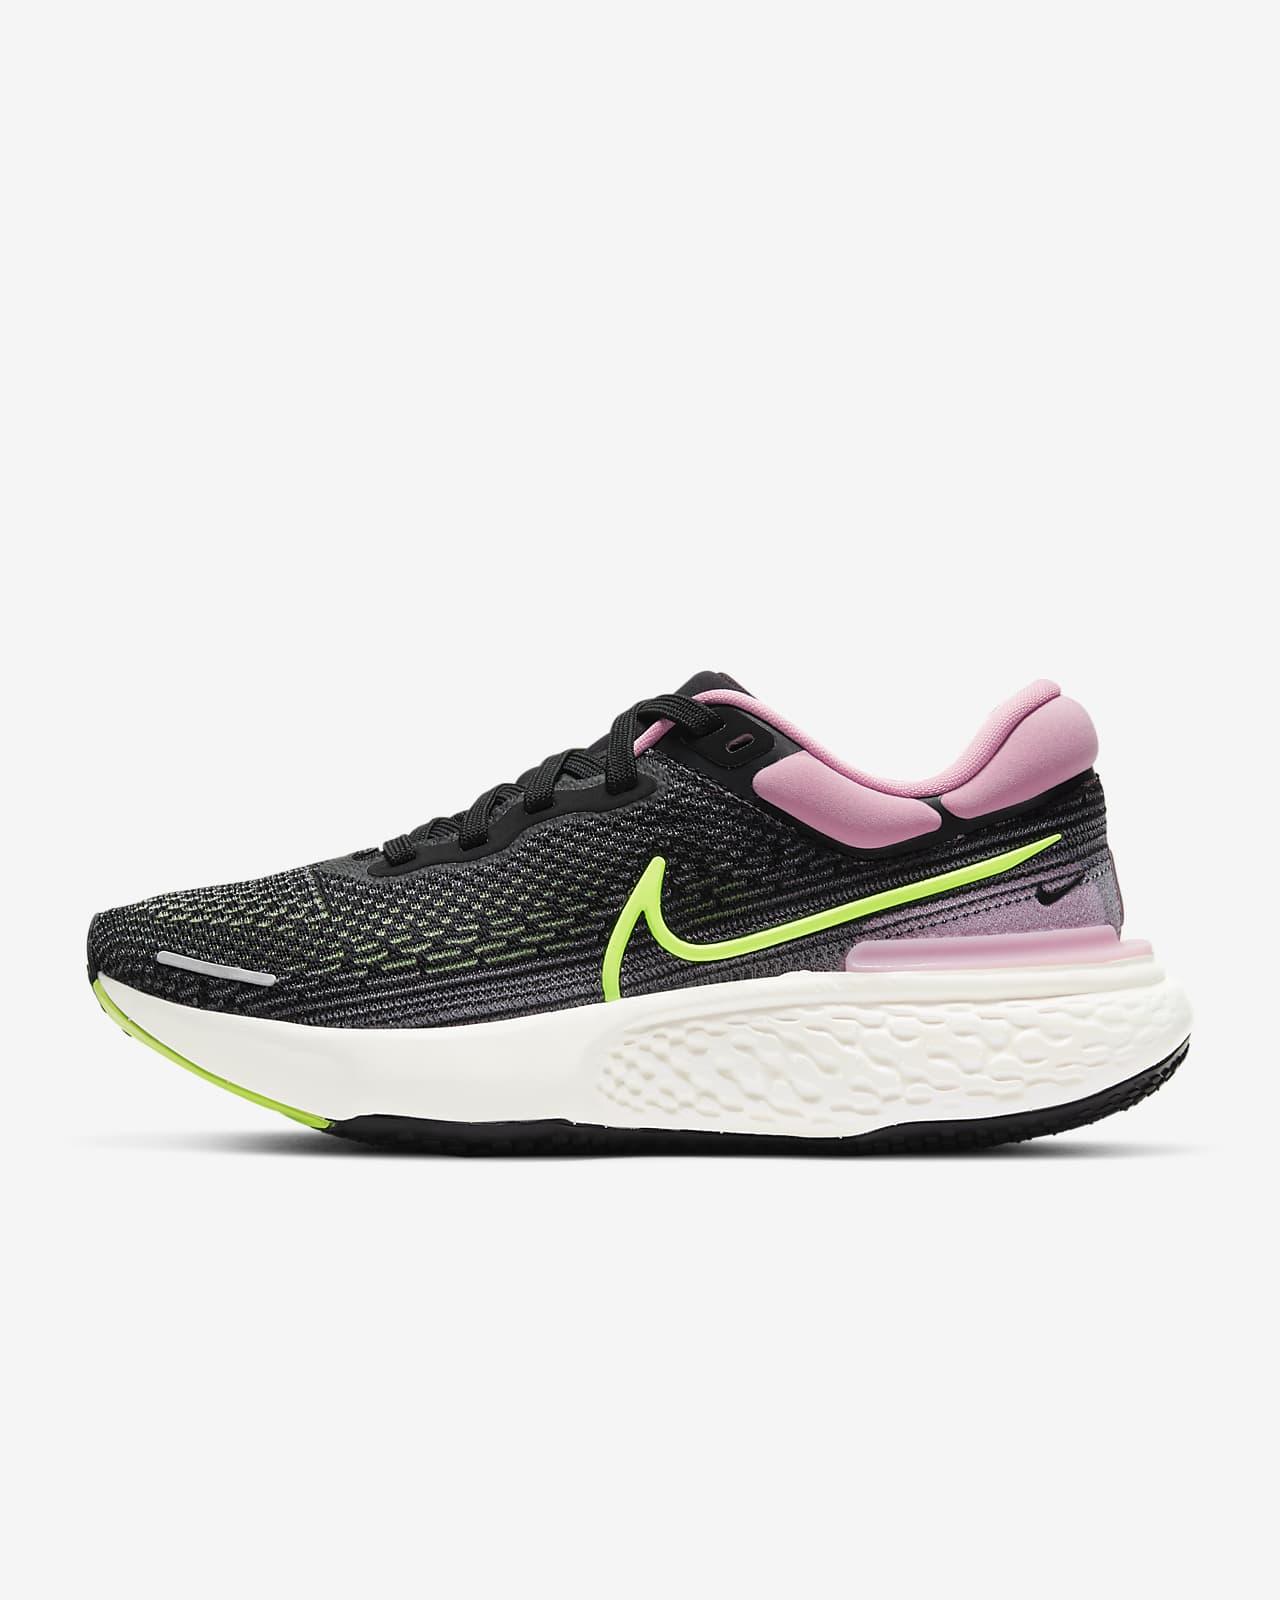 Nike ZoomX Invincible Run Flyknit 女款跑鞋